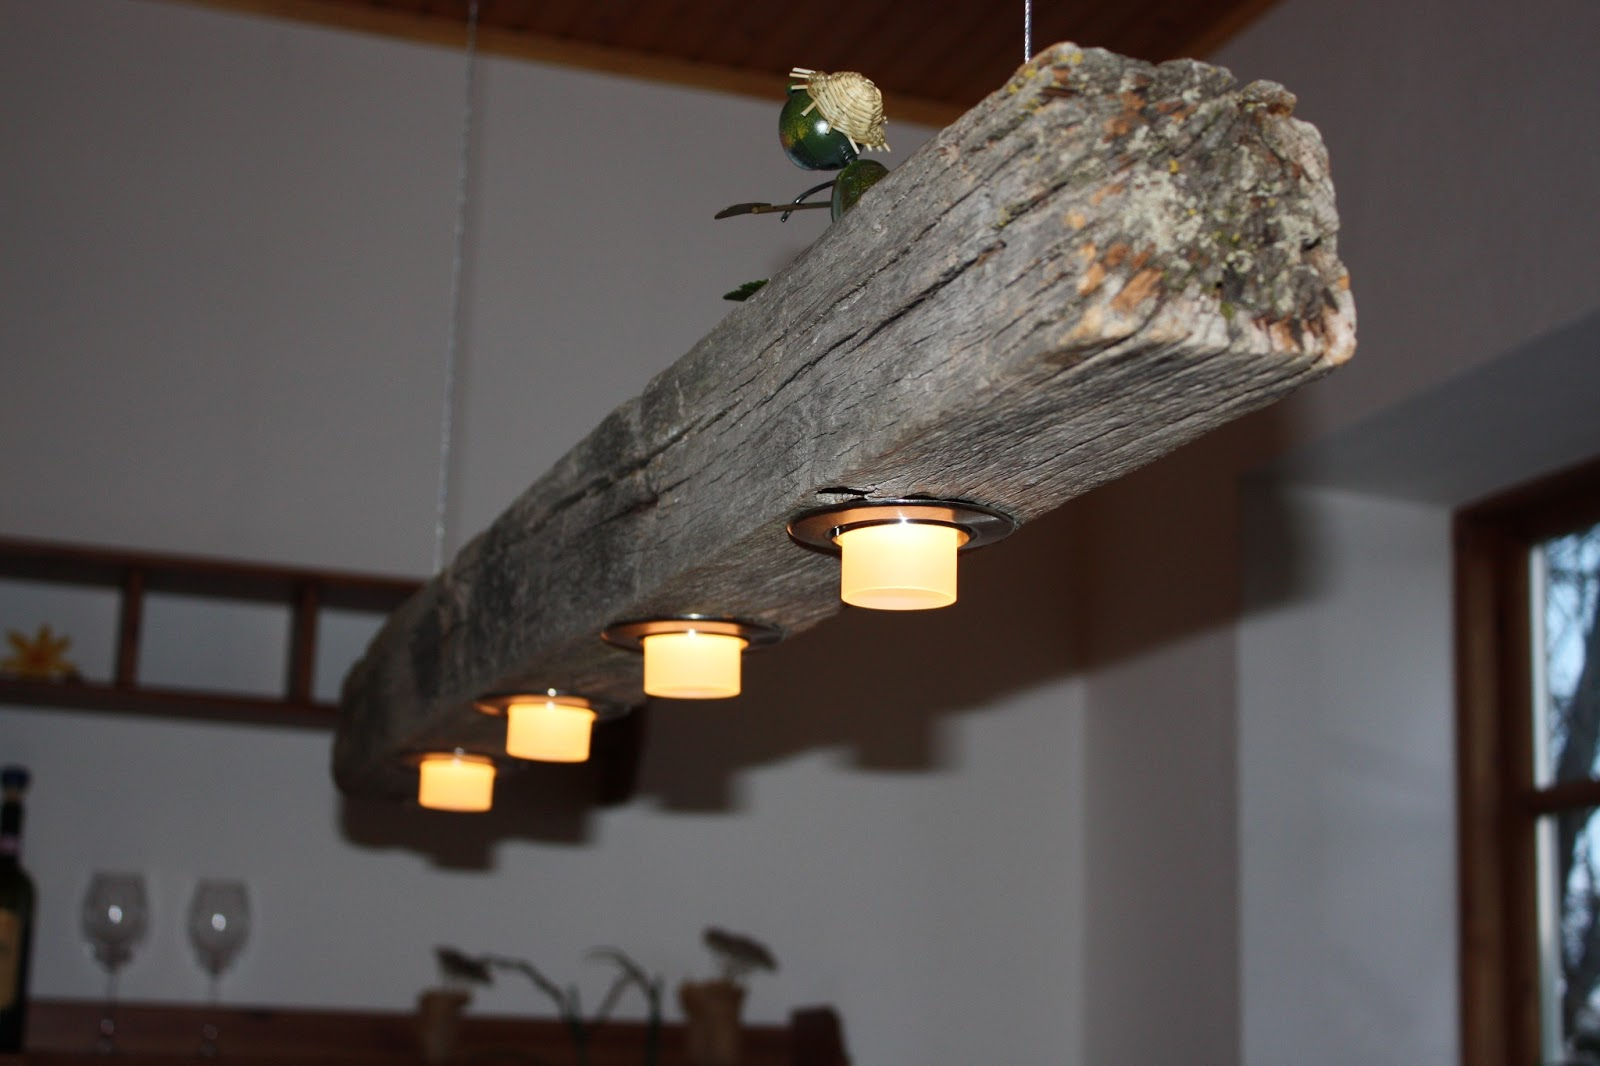 ikea lampen esszimmer kreatives haus design. Black Bedroom Furniture Sets. Home Design Ideas